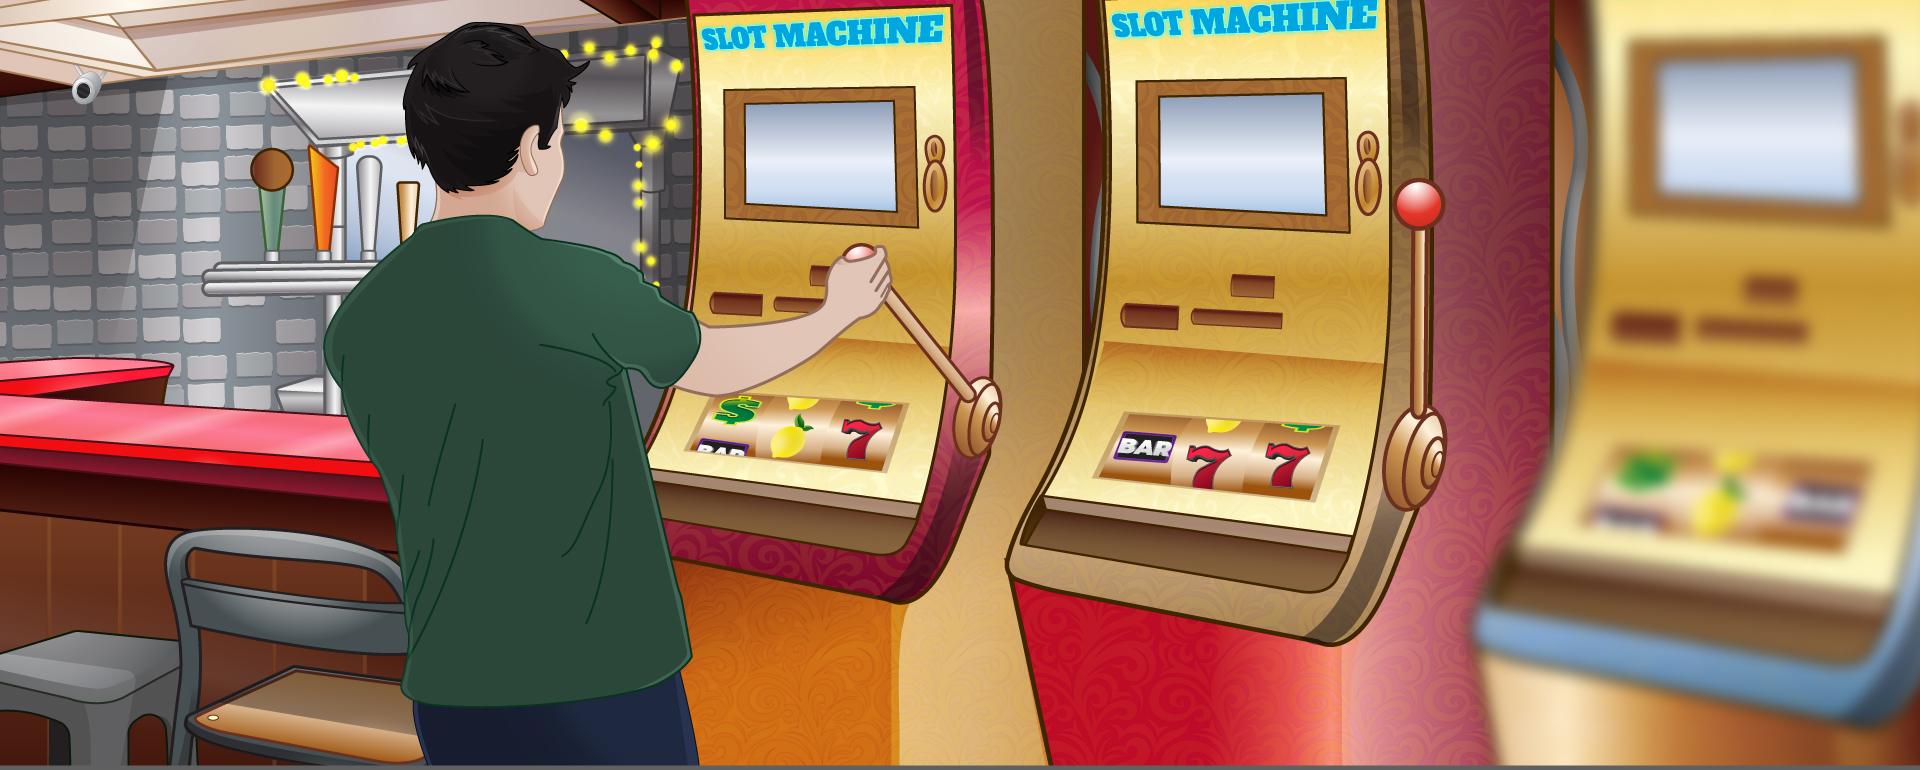 Jack point casino - 9016